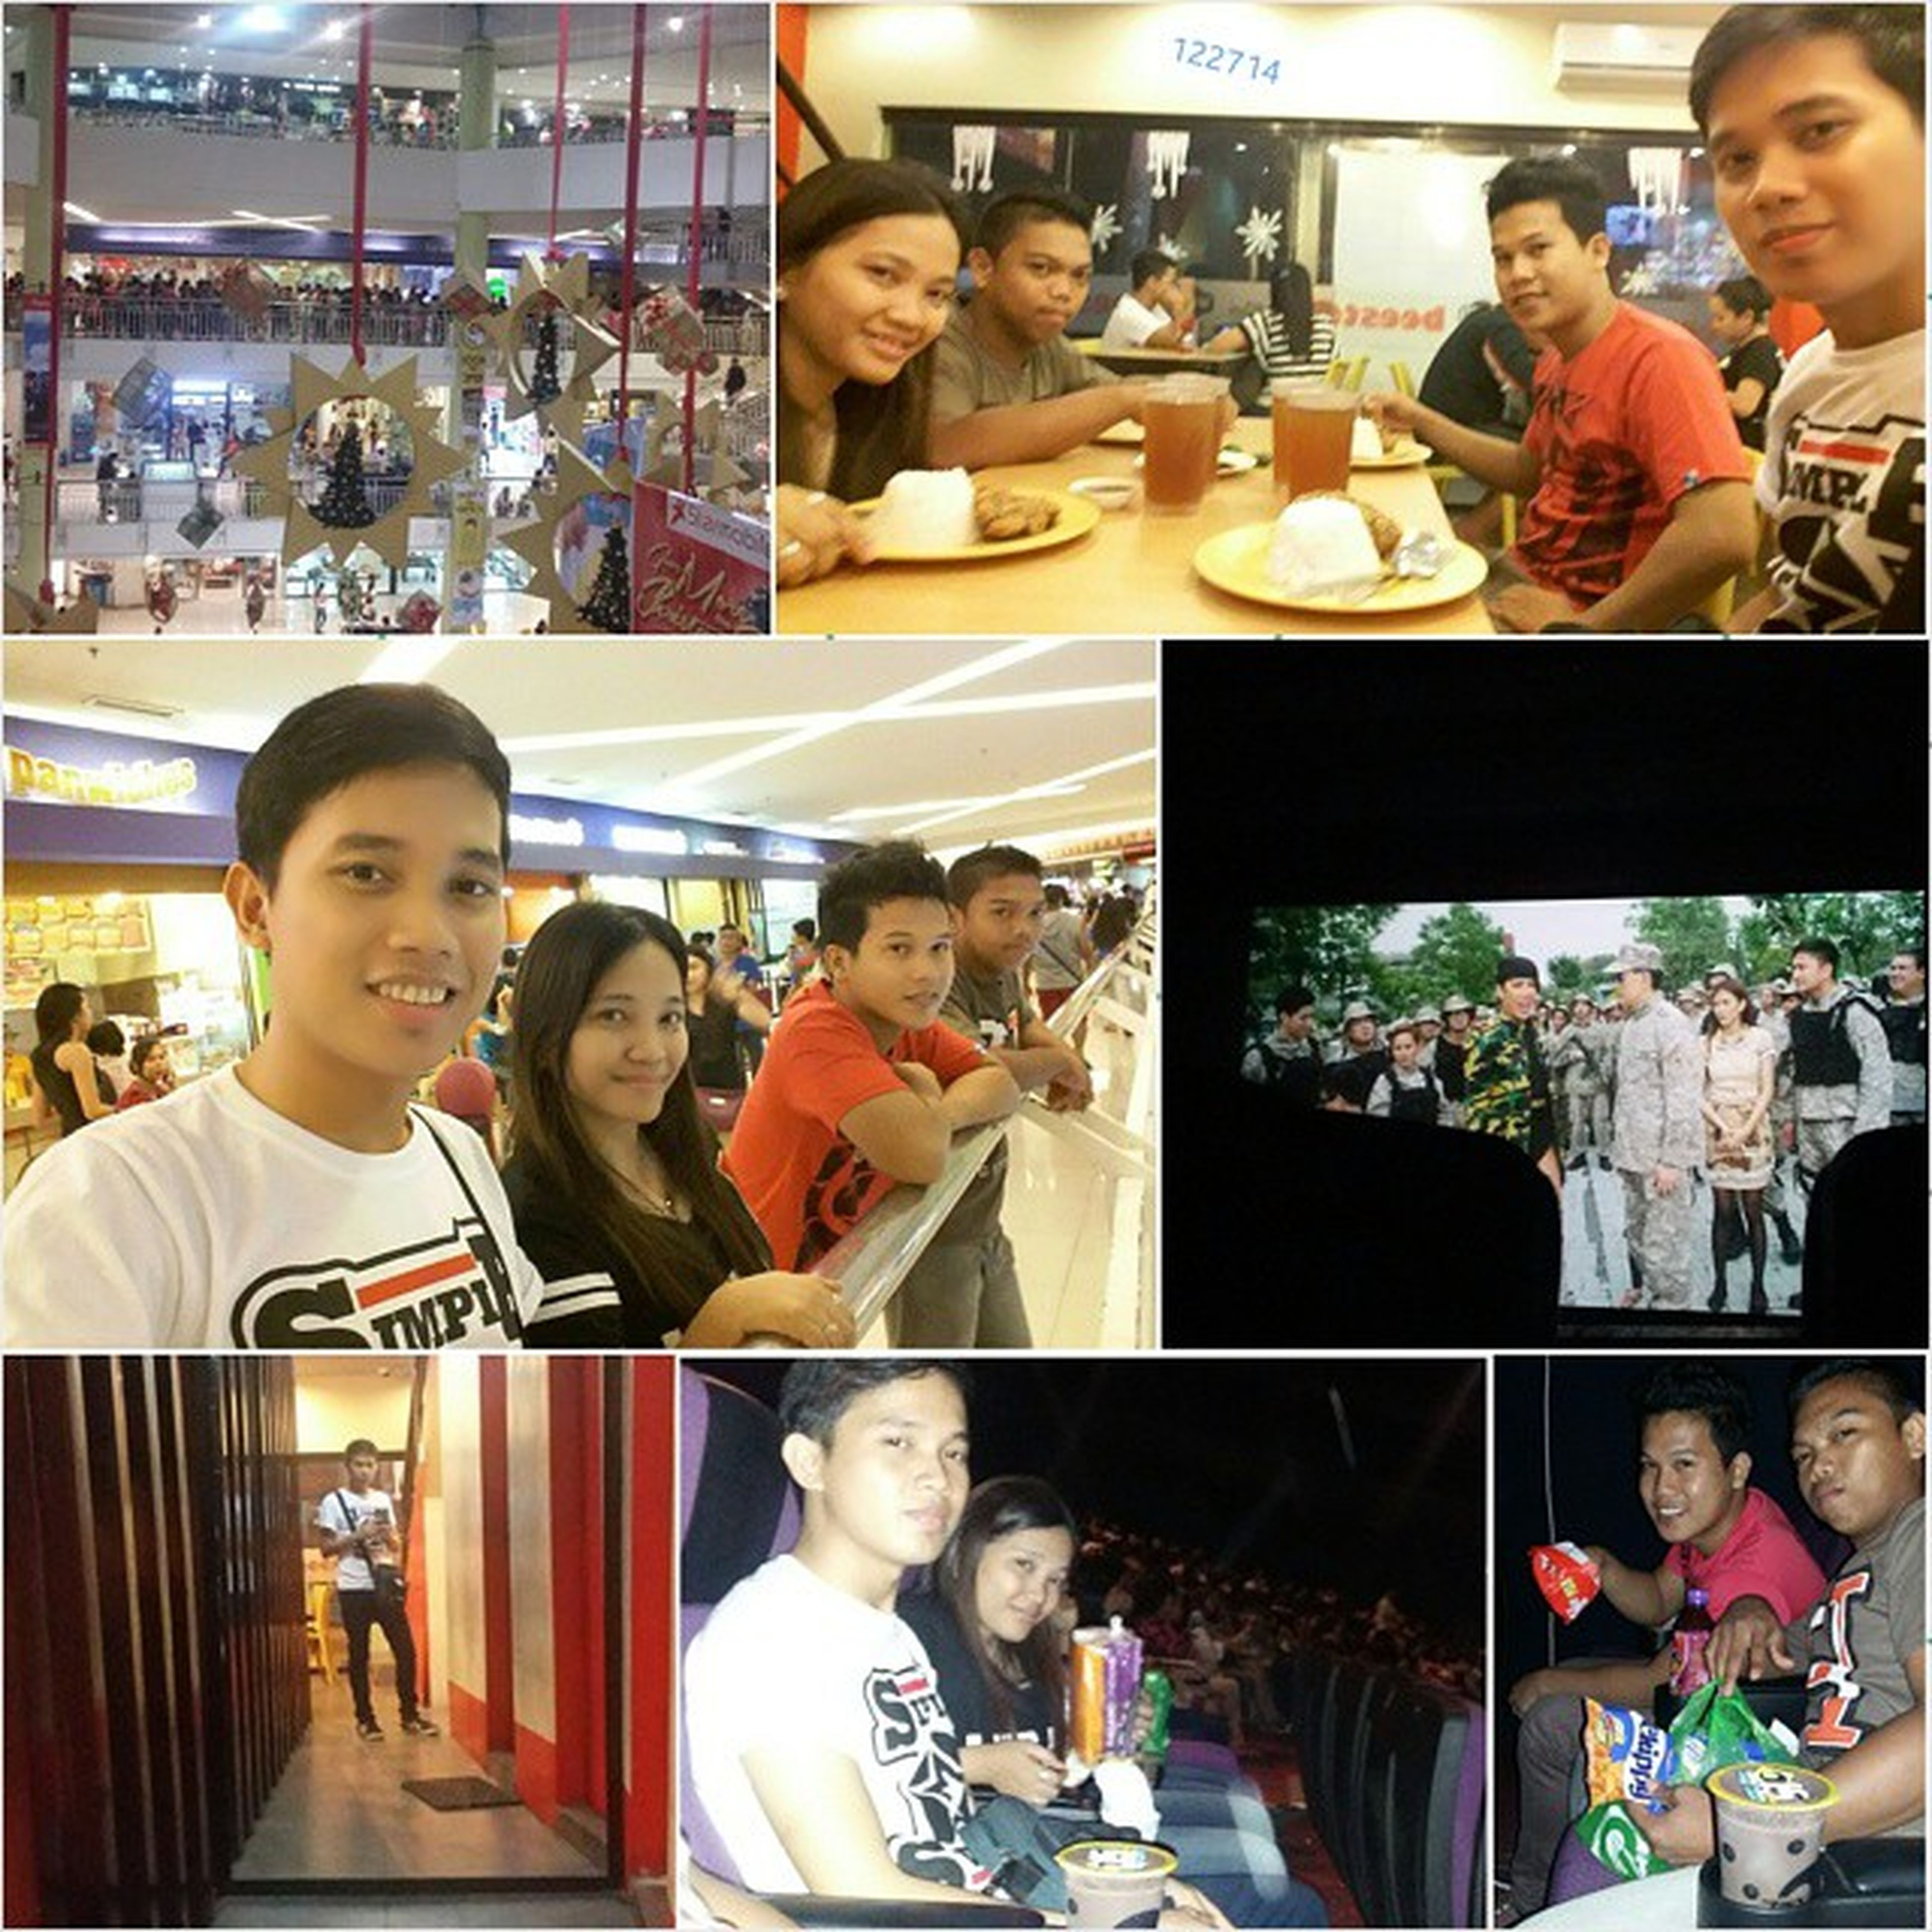 My movie date Brosiscous Theamazingpraybeytbenjamin TaasPila Lastsaturdayof2014 Gvpamore Goodevening